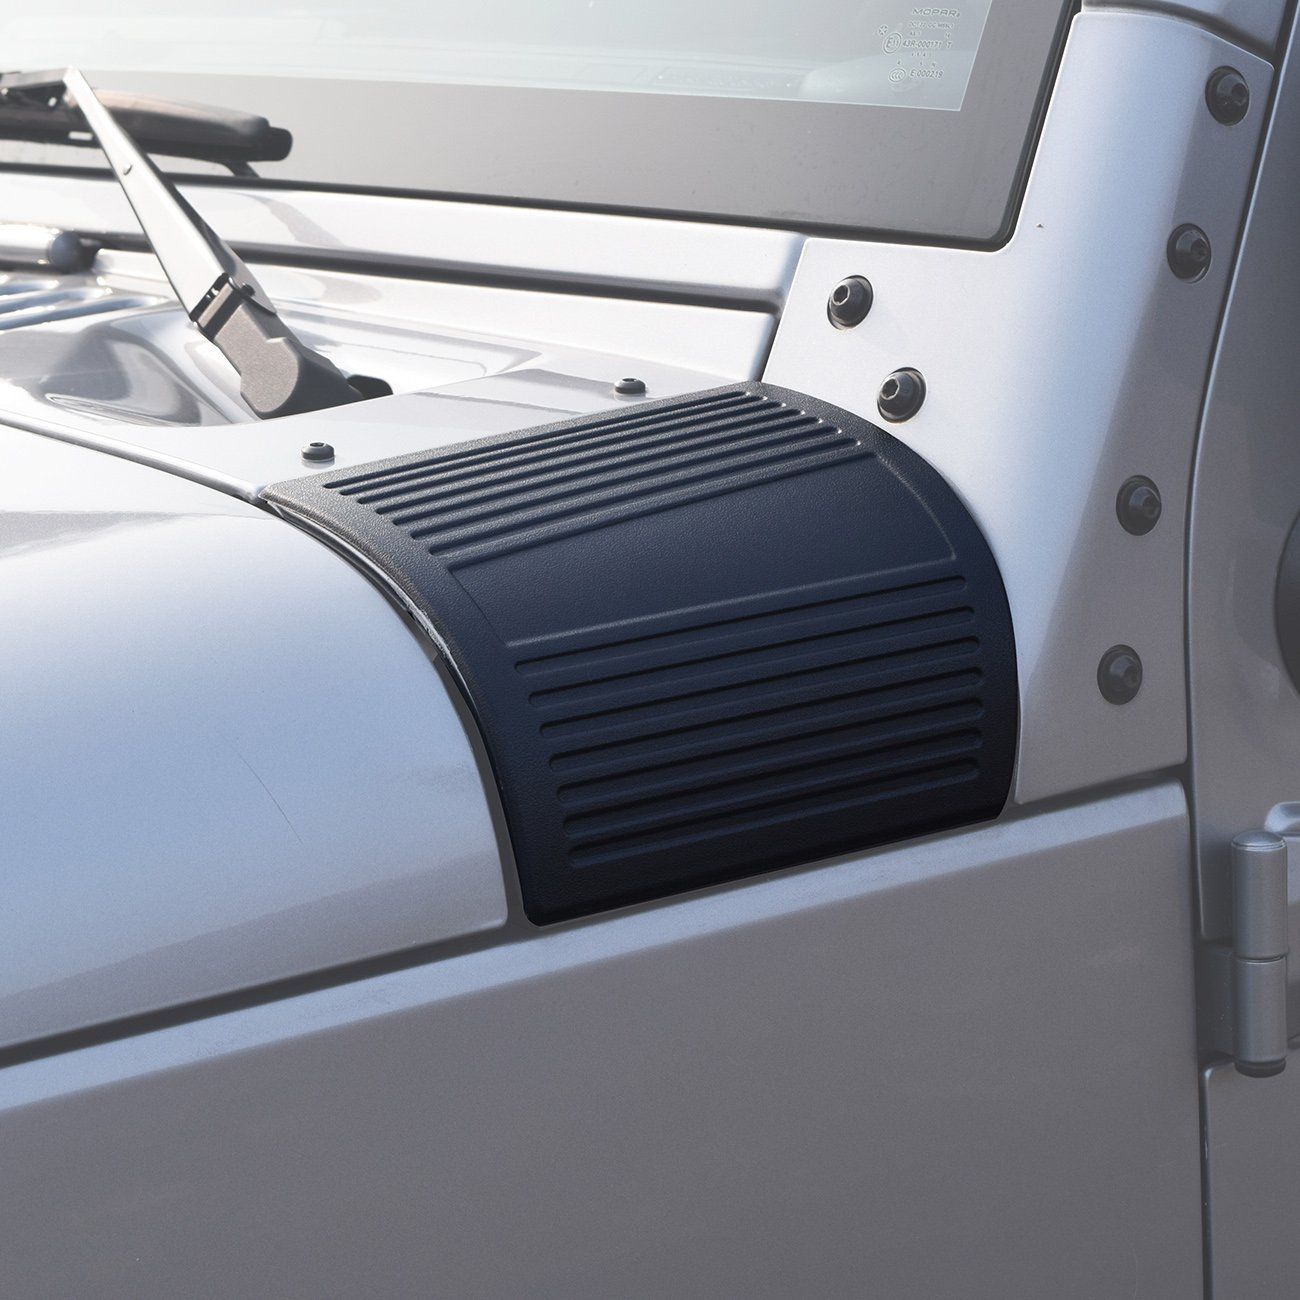 DIYTuning Cowl Body Armor for Jeep Wrangler JK JKU Unlimited Rubicon Sahara X Off Road Sport Exterior Accessories Parts 2007 2008 2009 2010 2011 2012 2013 2014 2015 2016 2017 DIYMaker